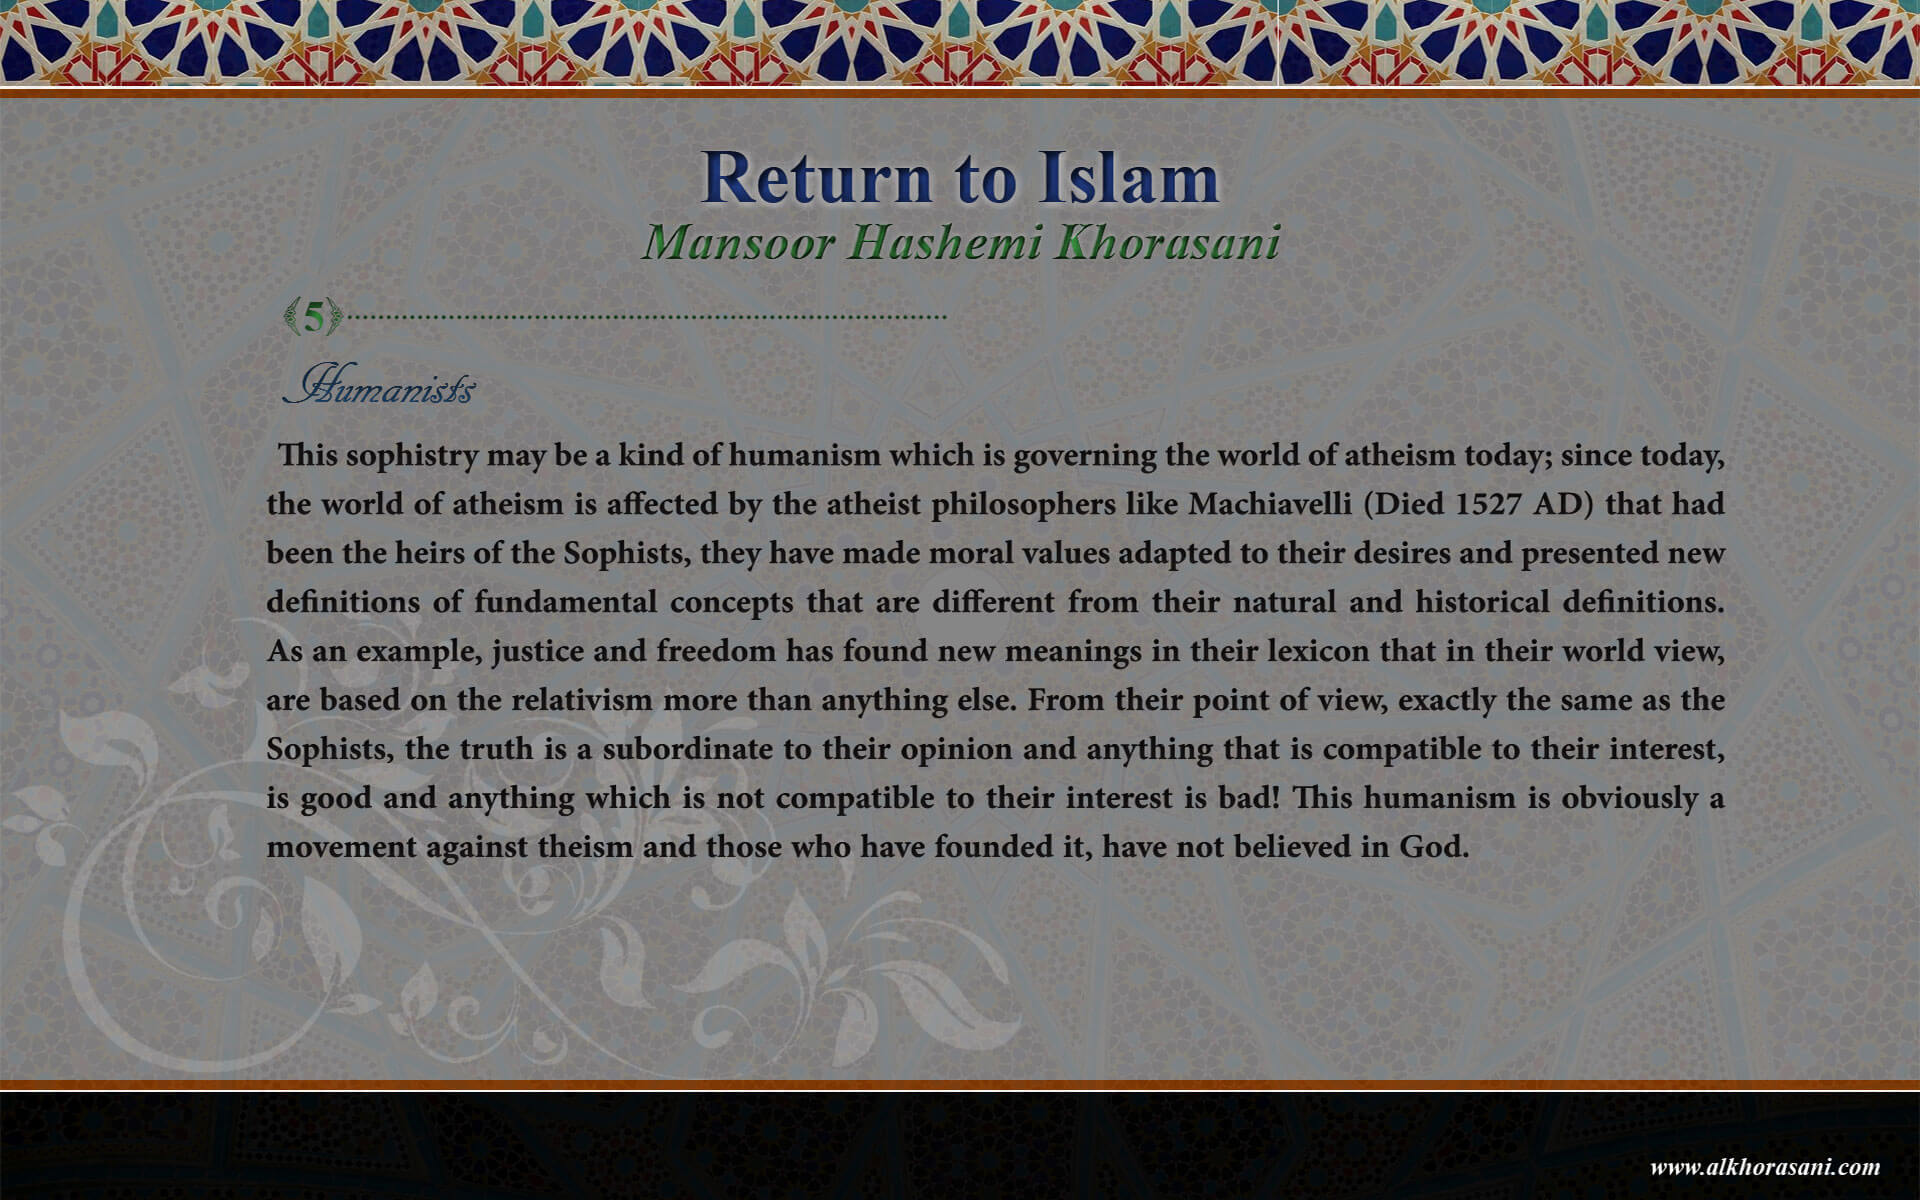 Humanists, Return to Islam